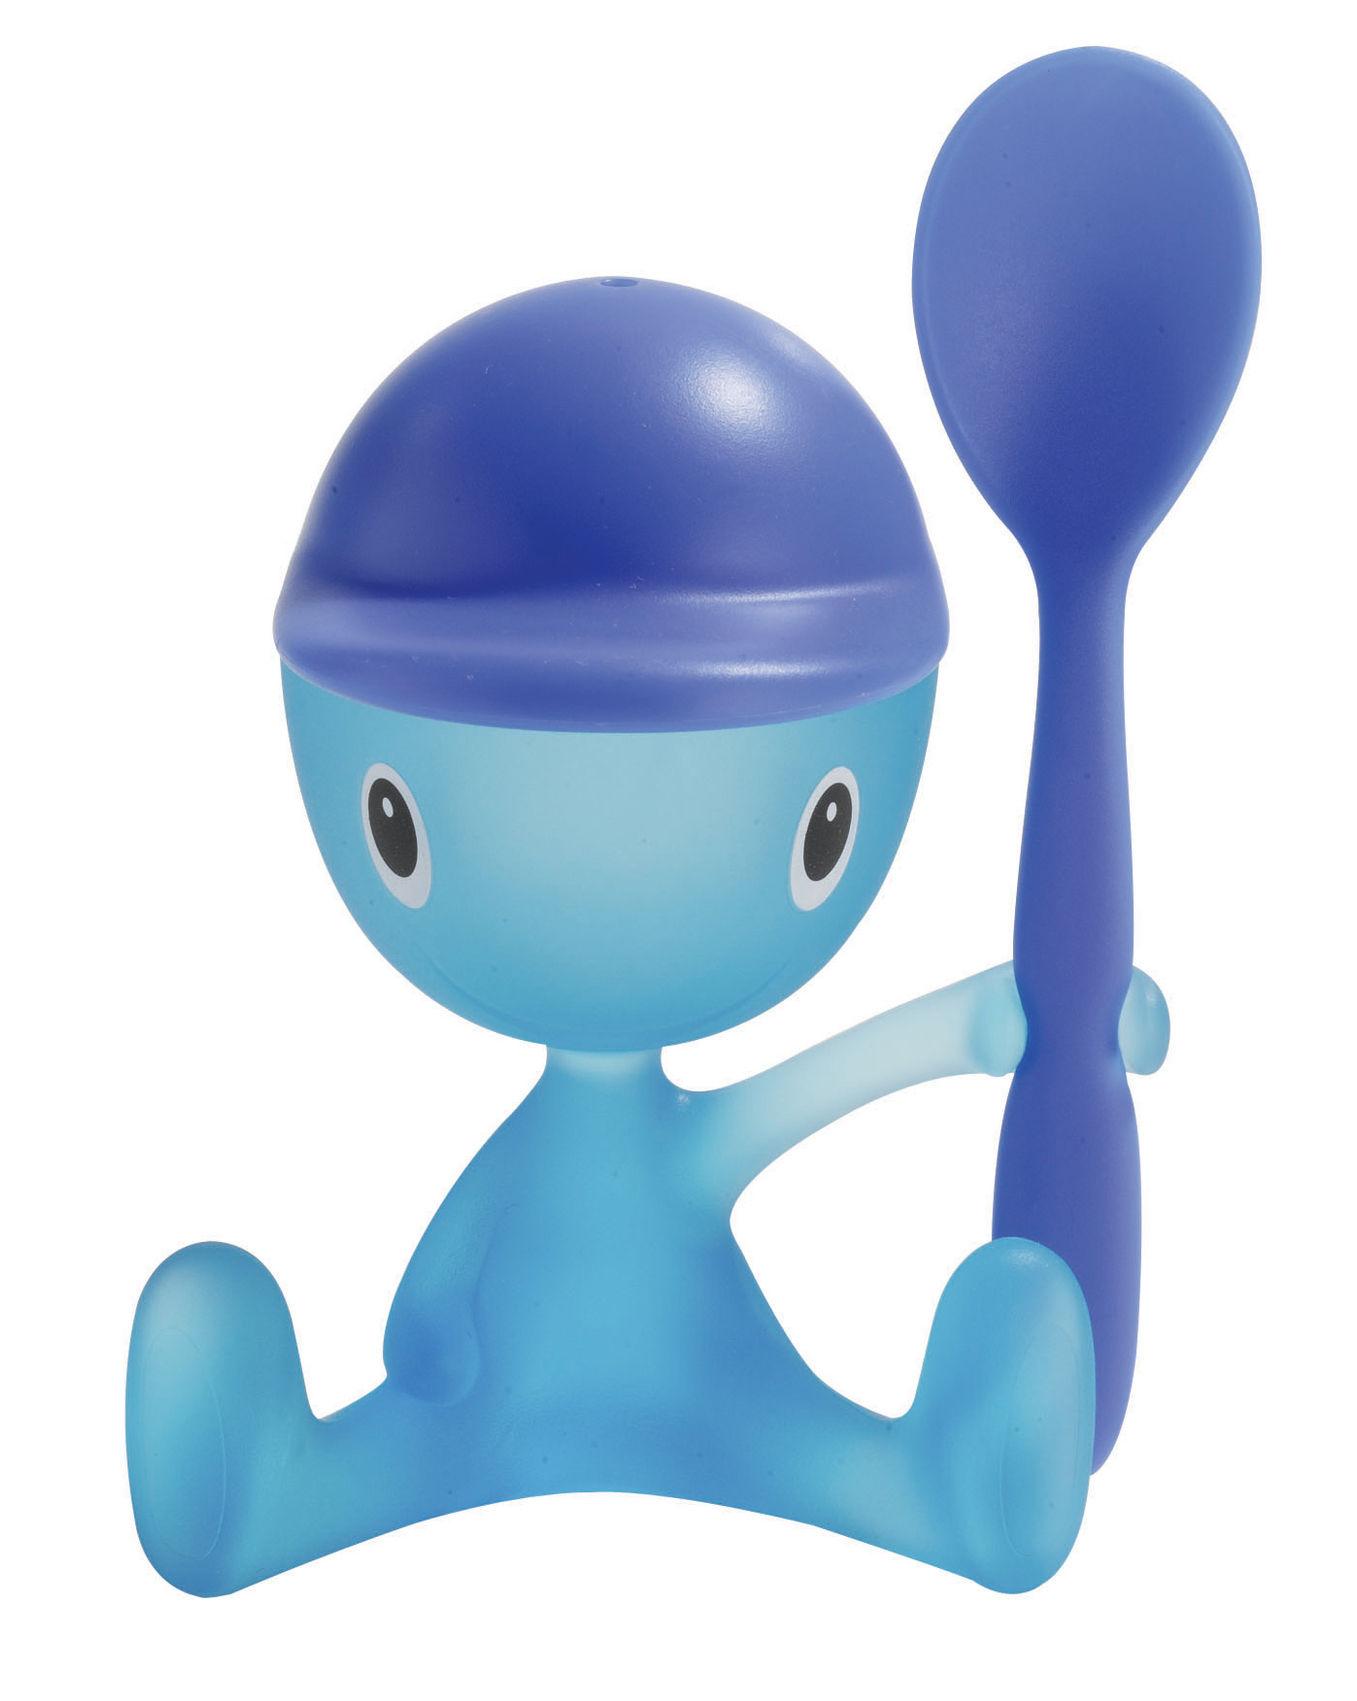 Arts de la table - Coquetiers - Coquetier Cico - A di Alessi - Bleu - Matière plastique